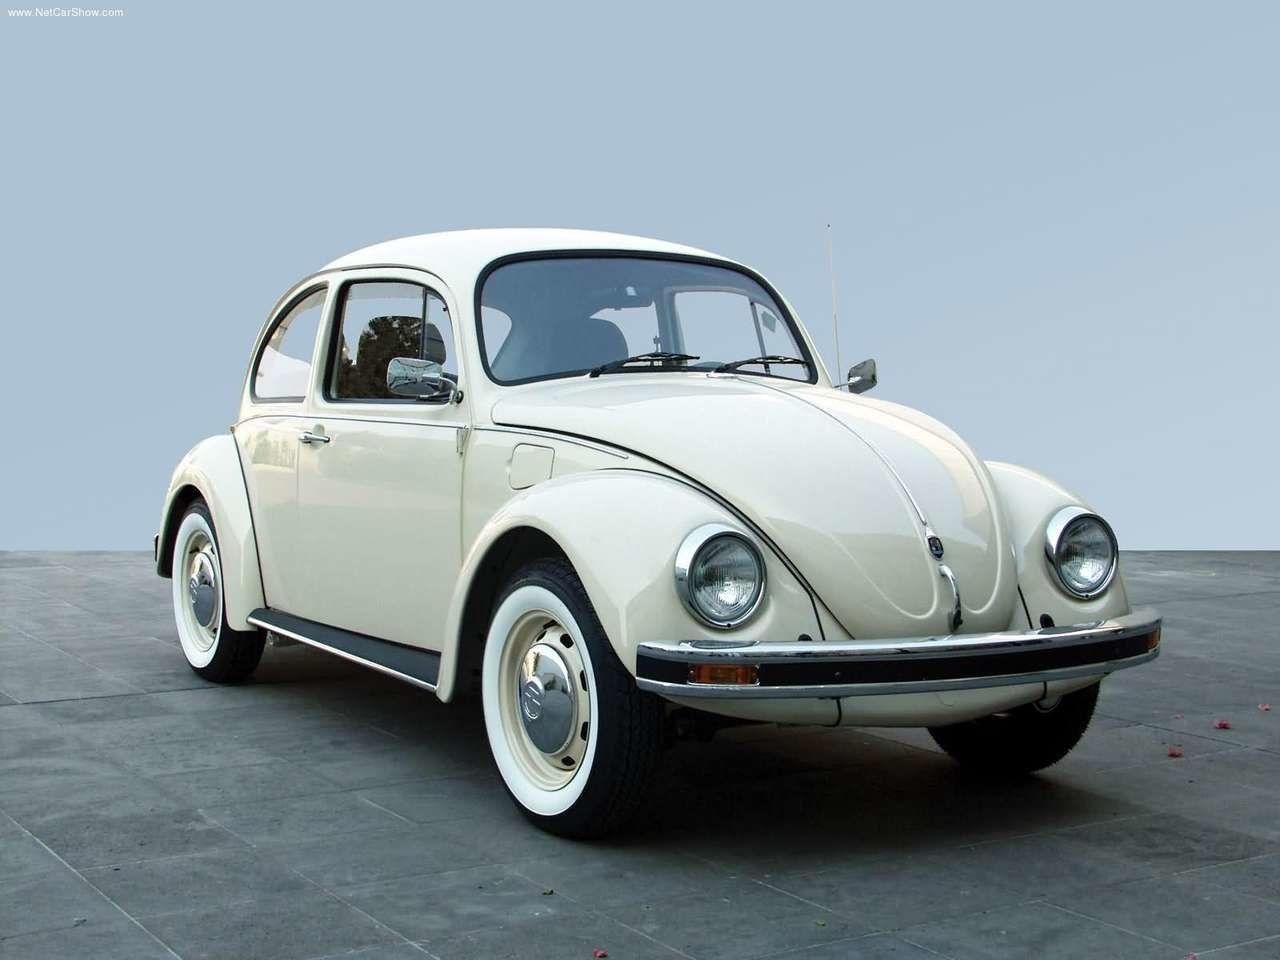 [Loic57] Mes autres vehicules - Page 3 Volkswagen-Beetle_Last_Edition_2003_1280x960_wallpaper_02